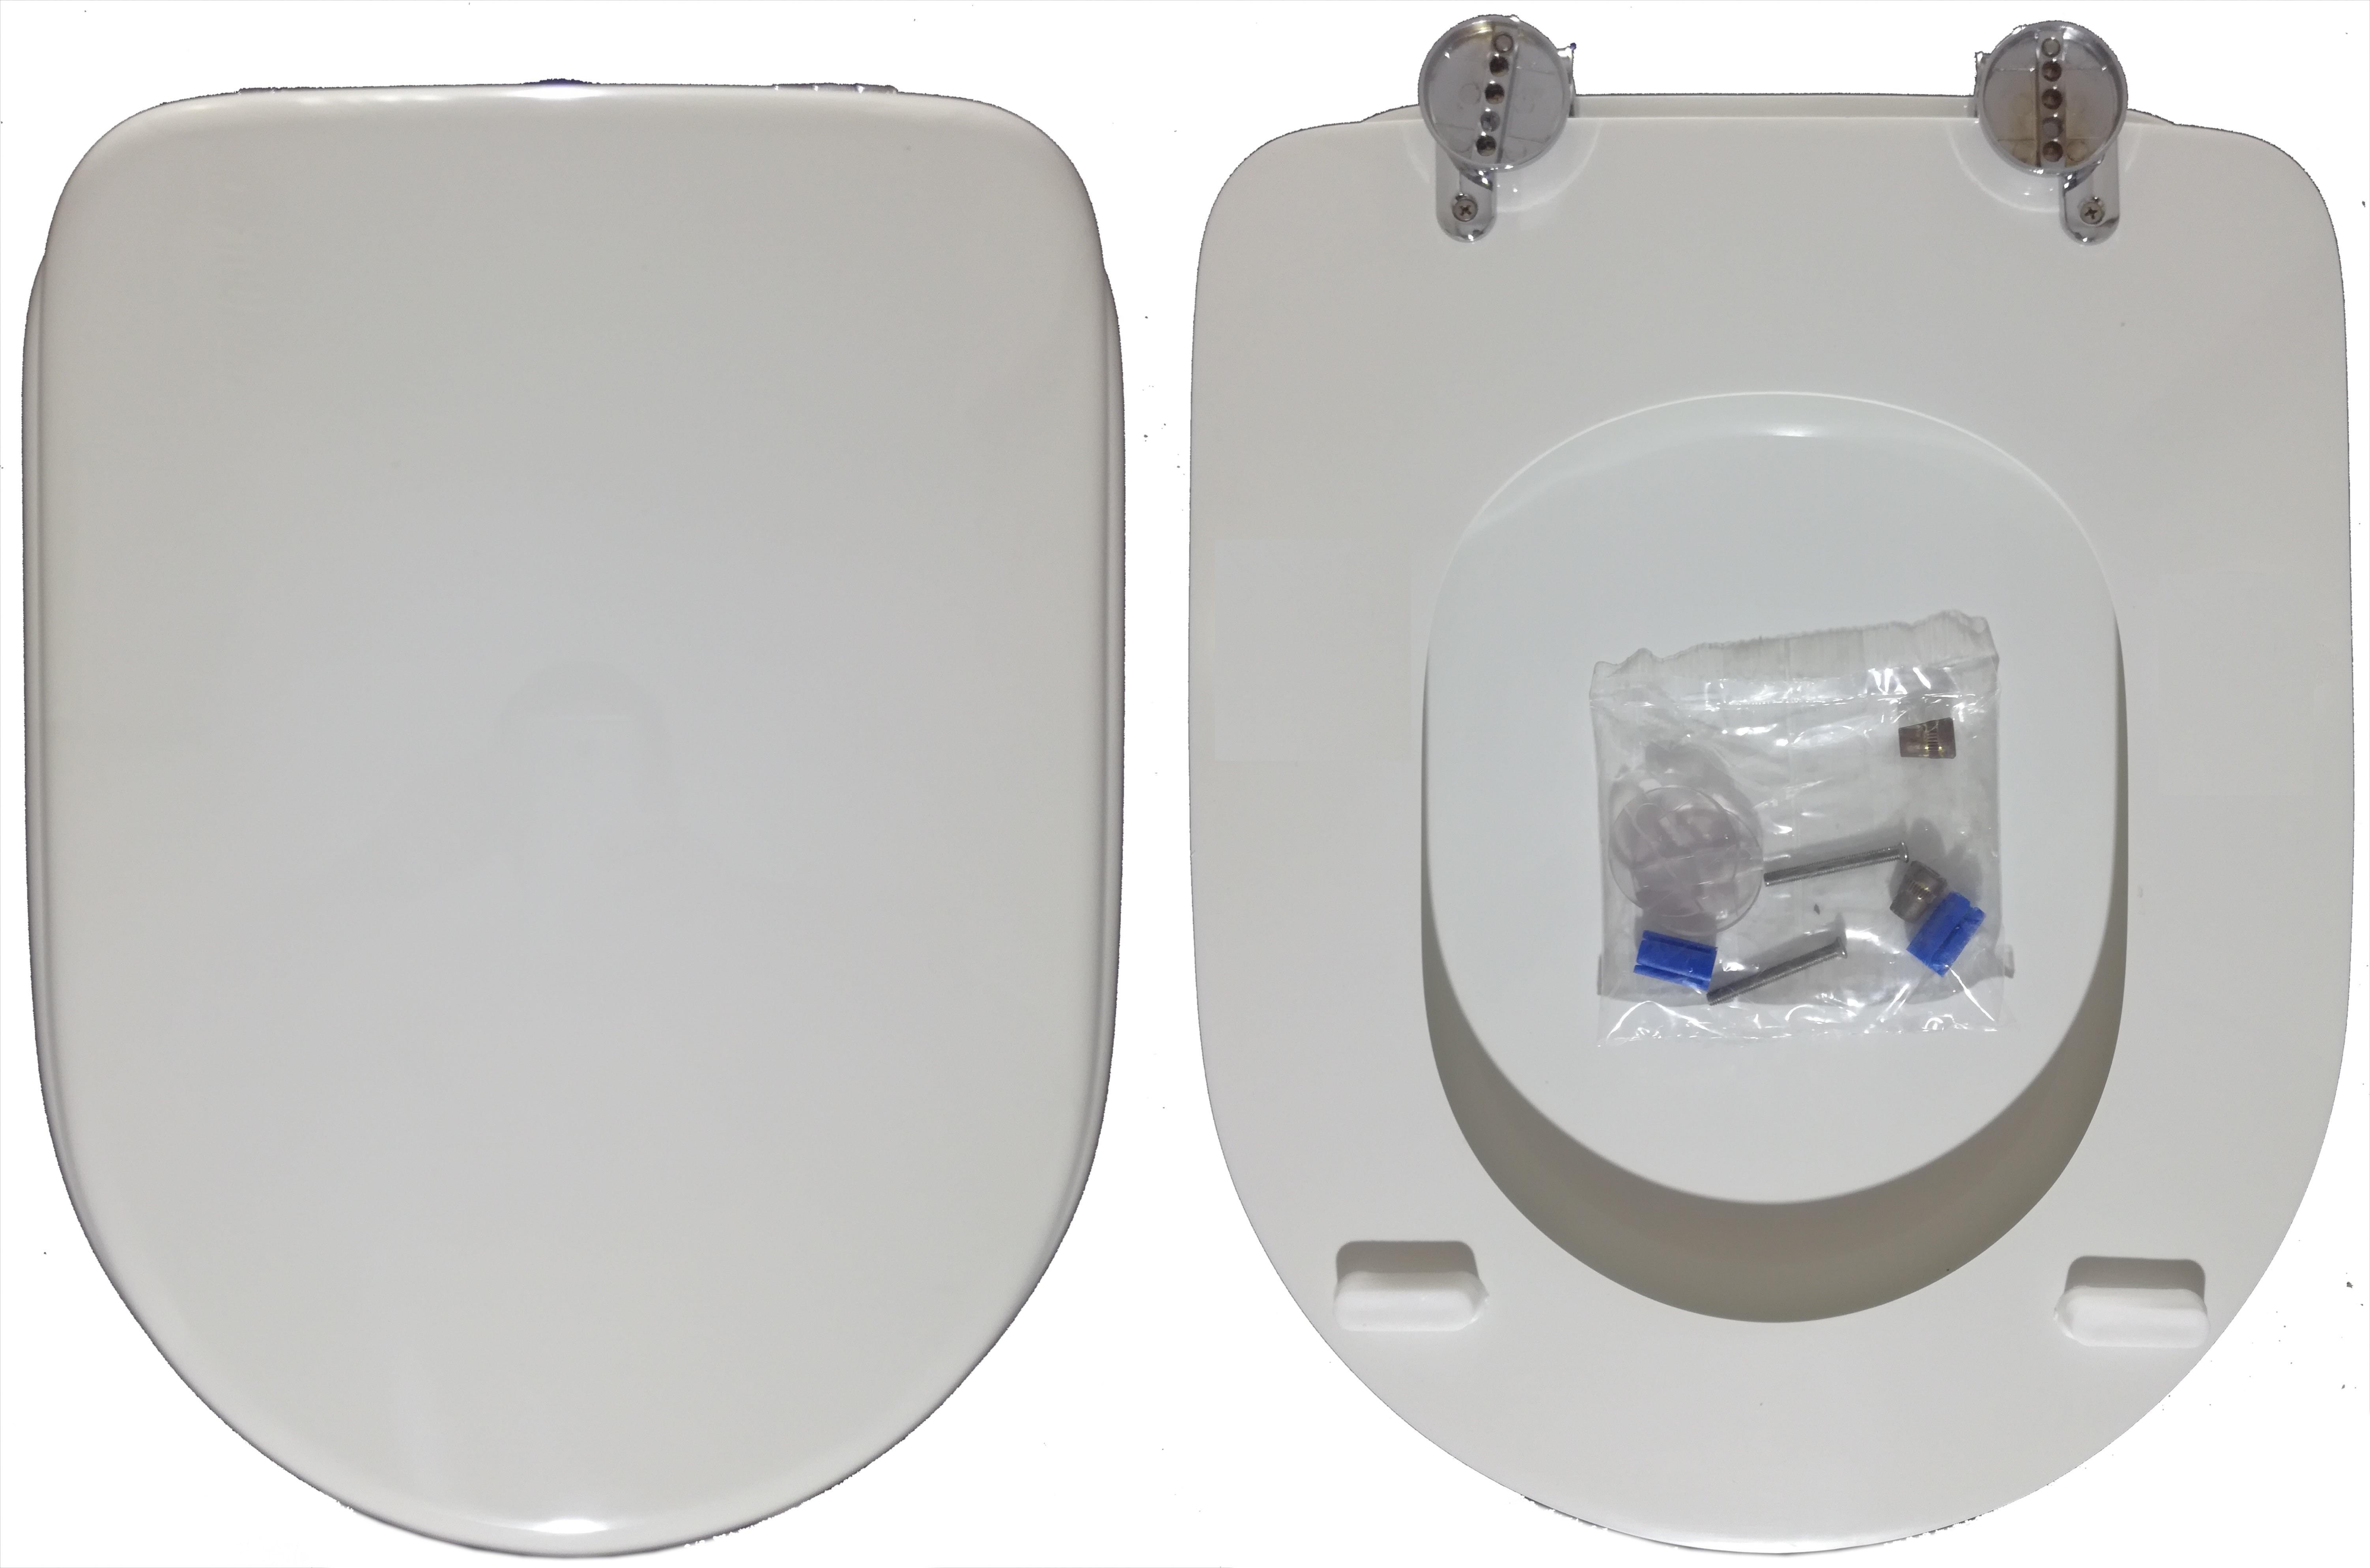 Sedile Wc Disabili Ideal Standard.Copriwater Esedra Ideal Standard Copriwater Misure